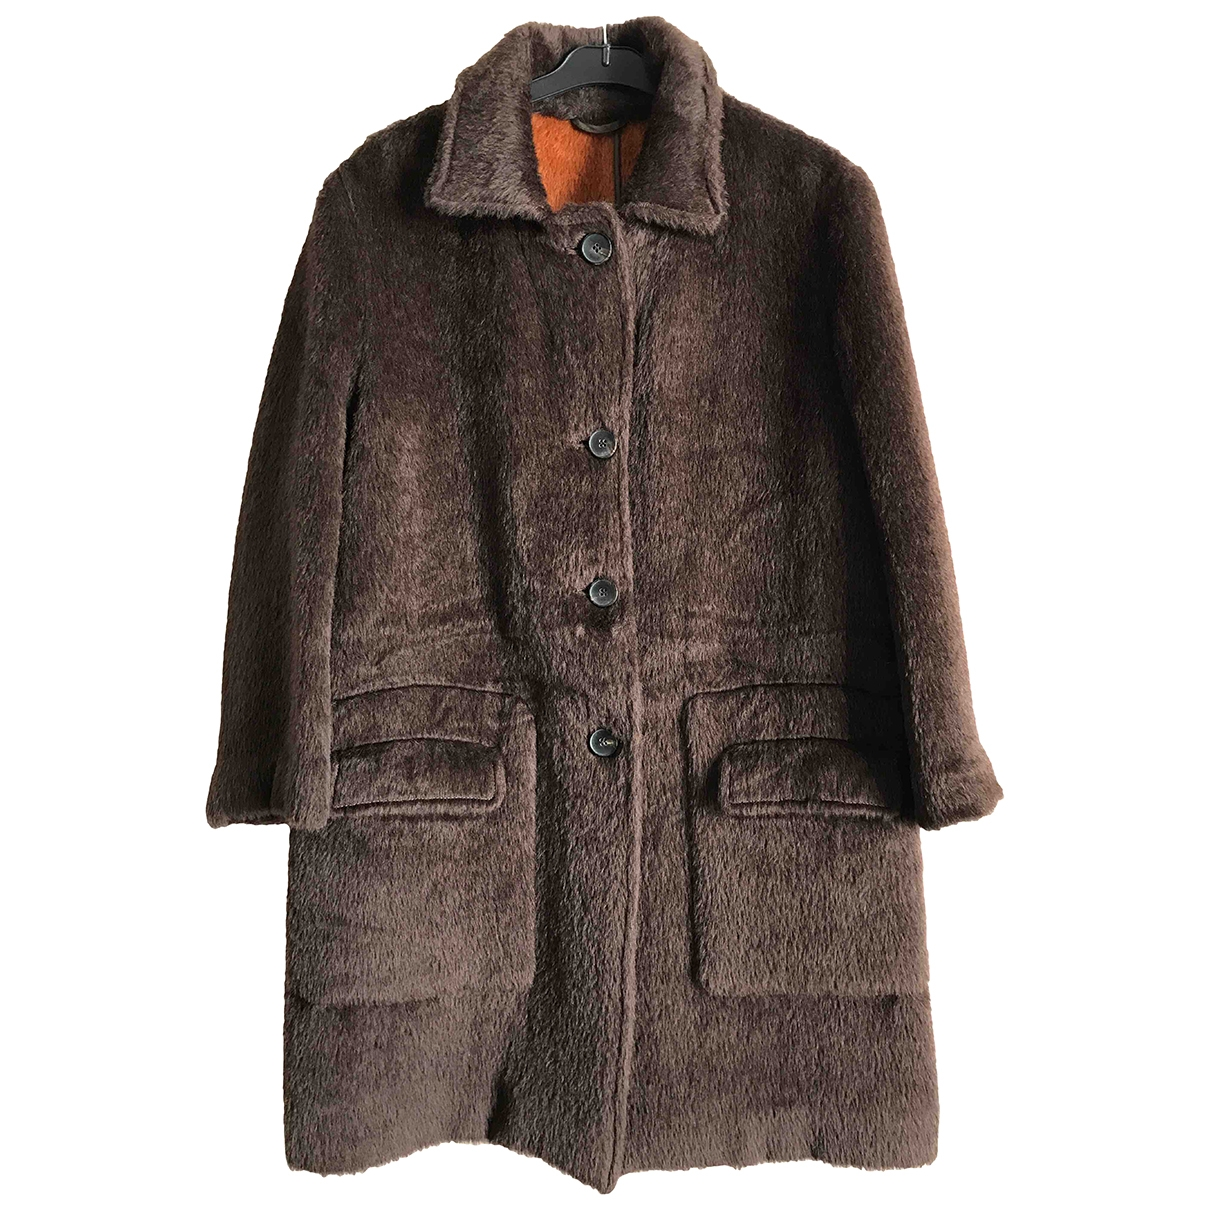 Etro \N Maentel in  Braun Wolle